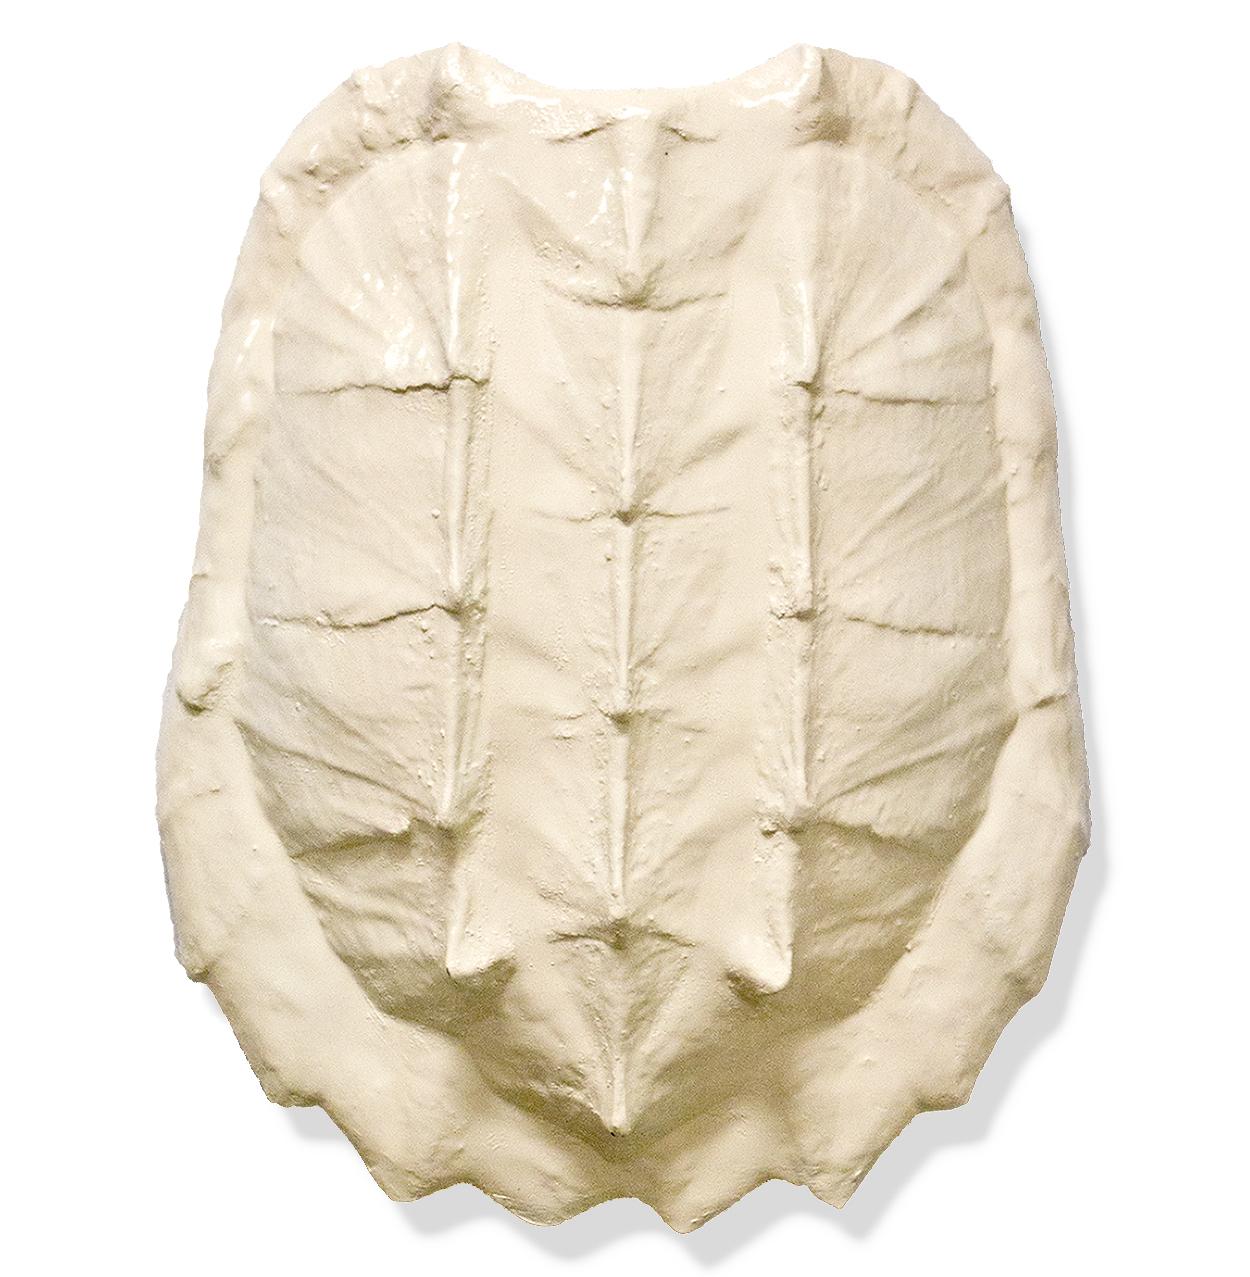 Duxbury Coastal Solid Ivory Gator Turtle Shell - by Karen Robertson